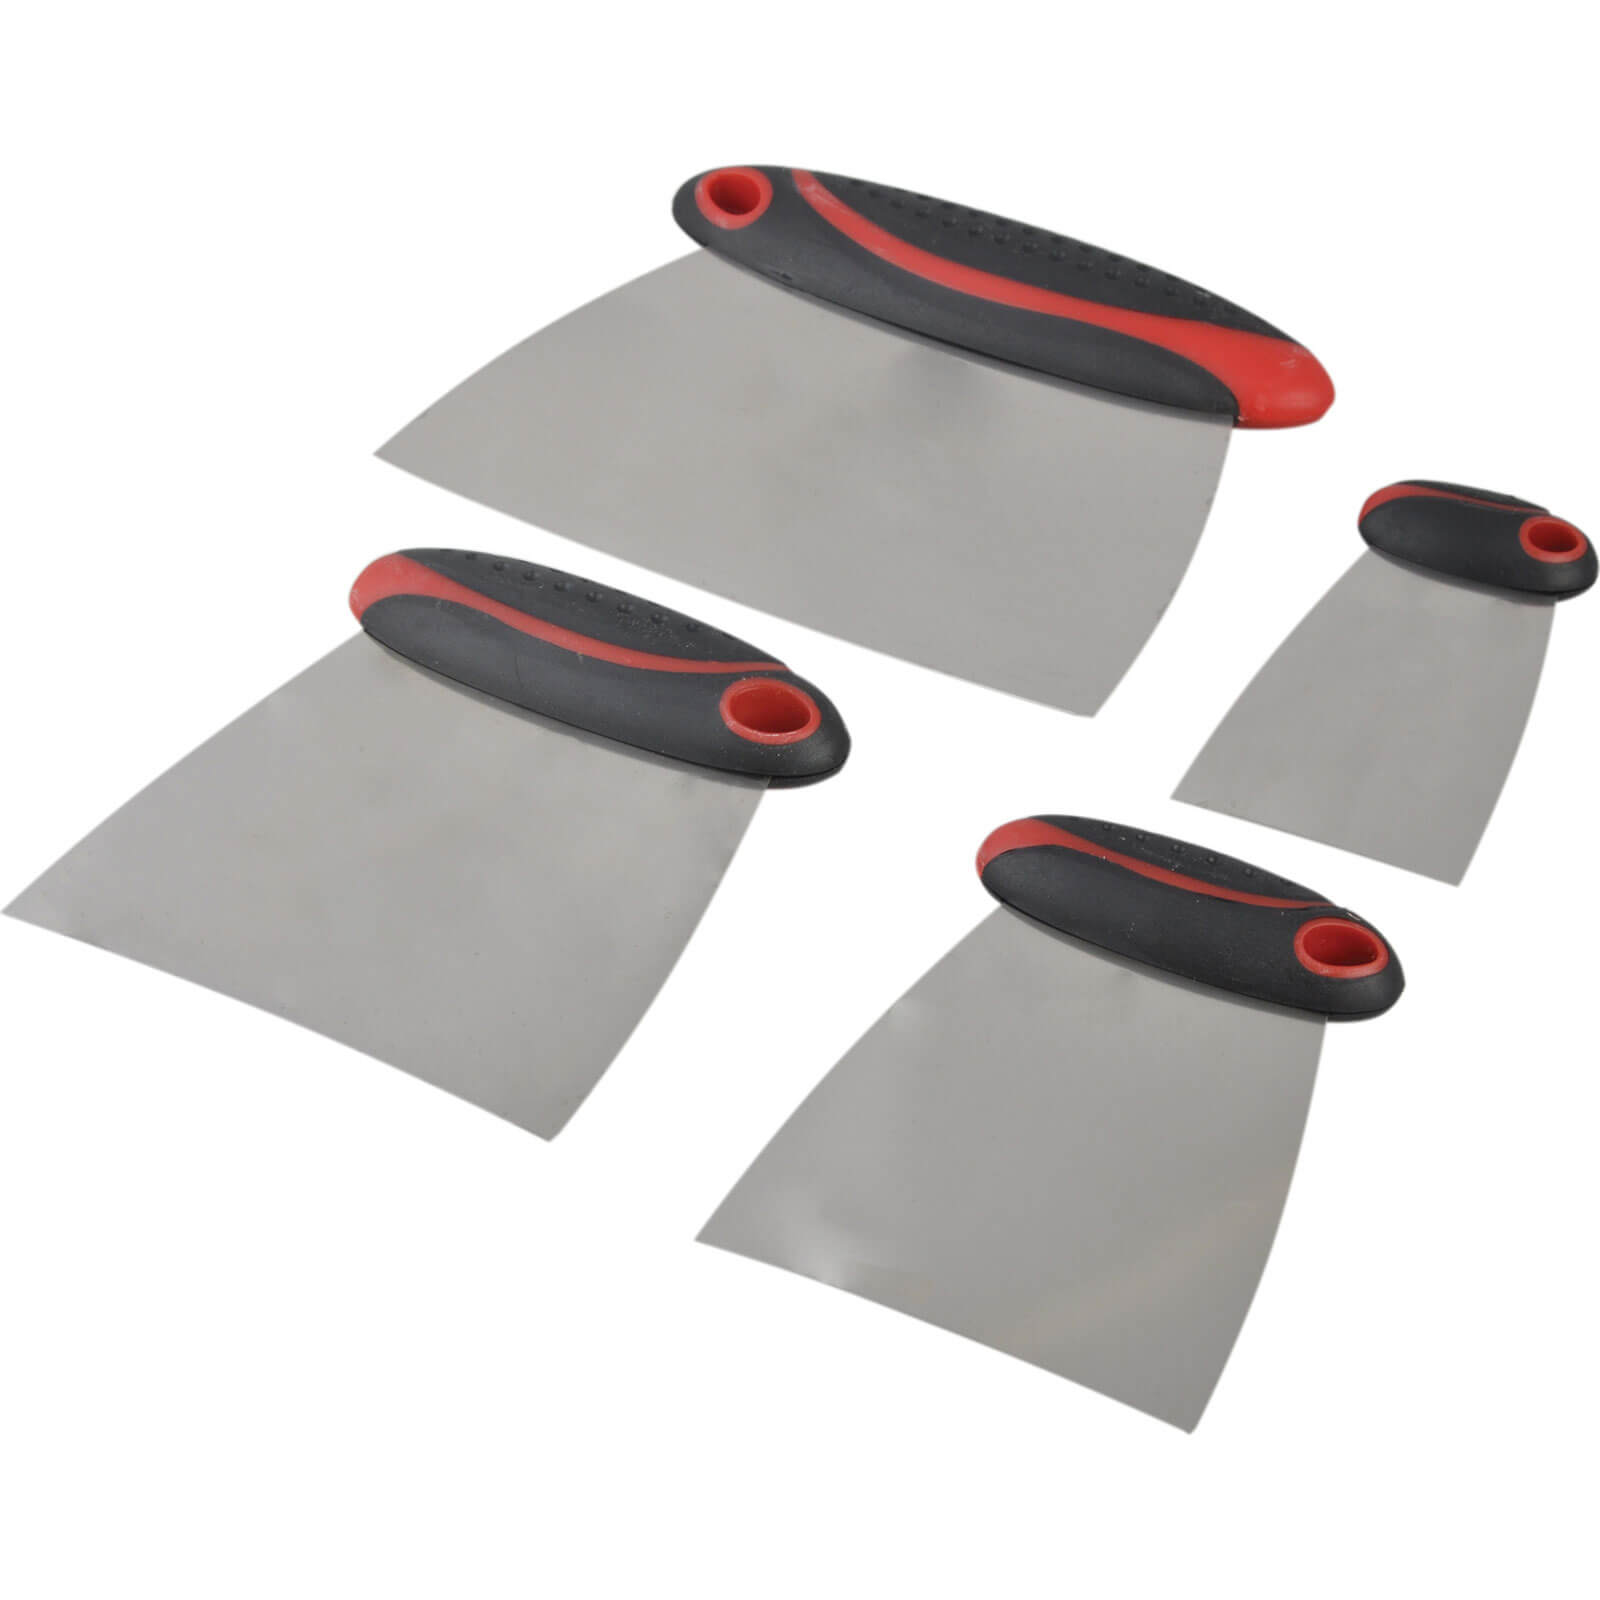 Image of Faithfull 4 Piece Stainless Steel Filler & Spreader Set